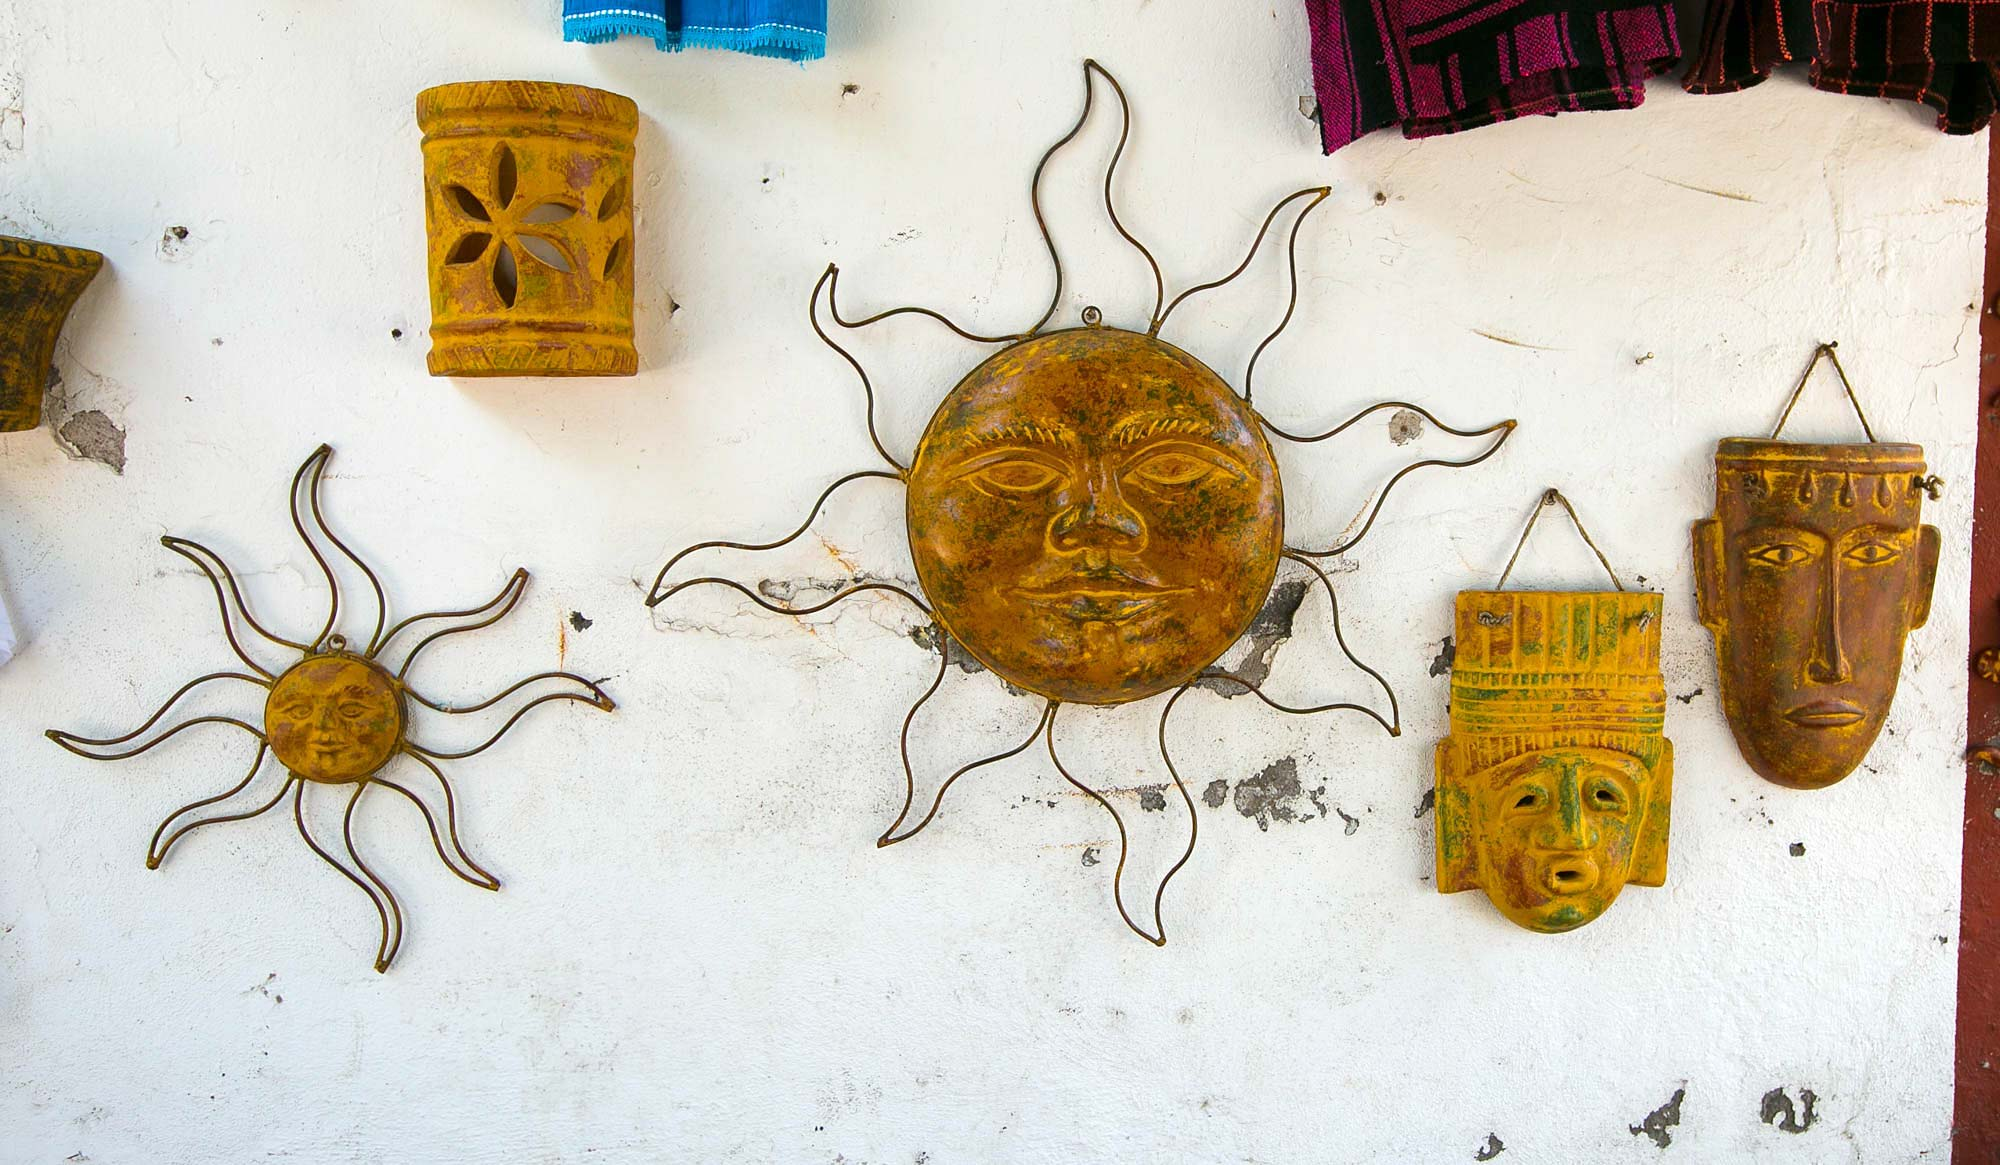 Cool wall hangings in Loreto